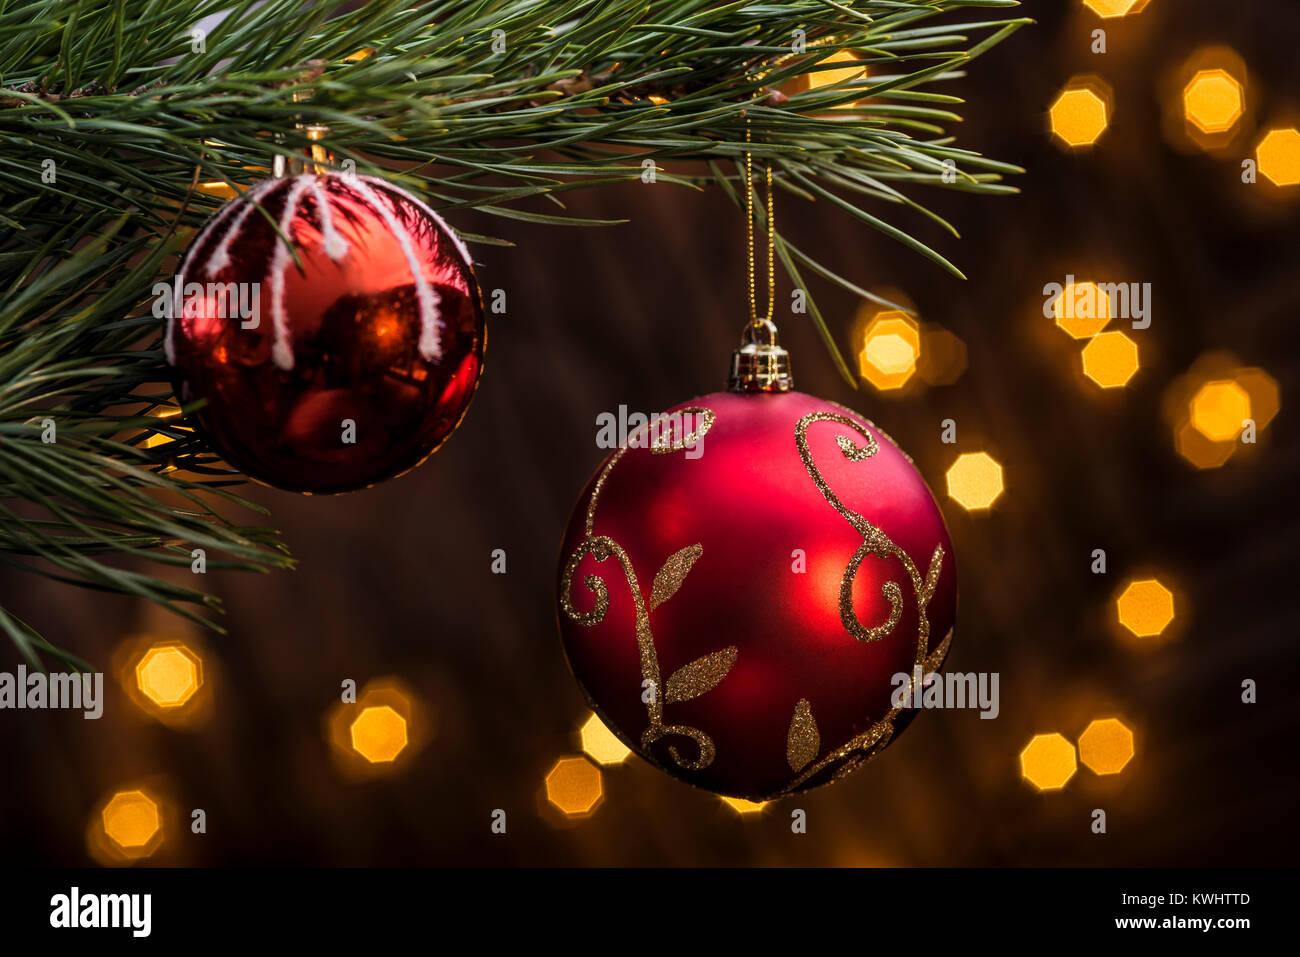 e43c0a1ec71 Bola roja colgando del árbol de navidad con luces festivas de fucus en  segundo plano.